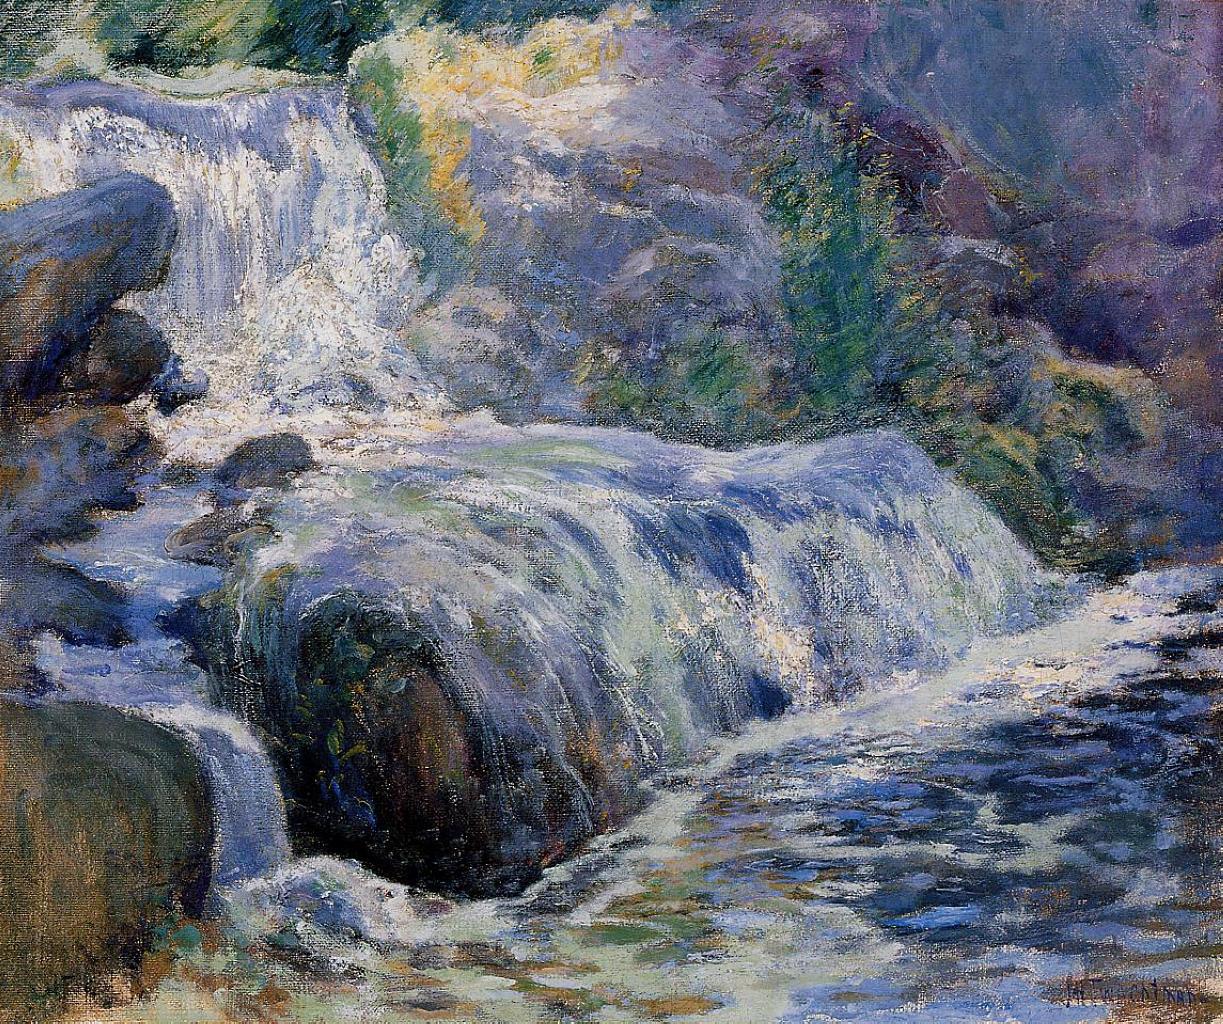 Waterfall, 1895-1899